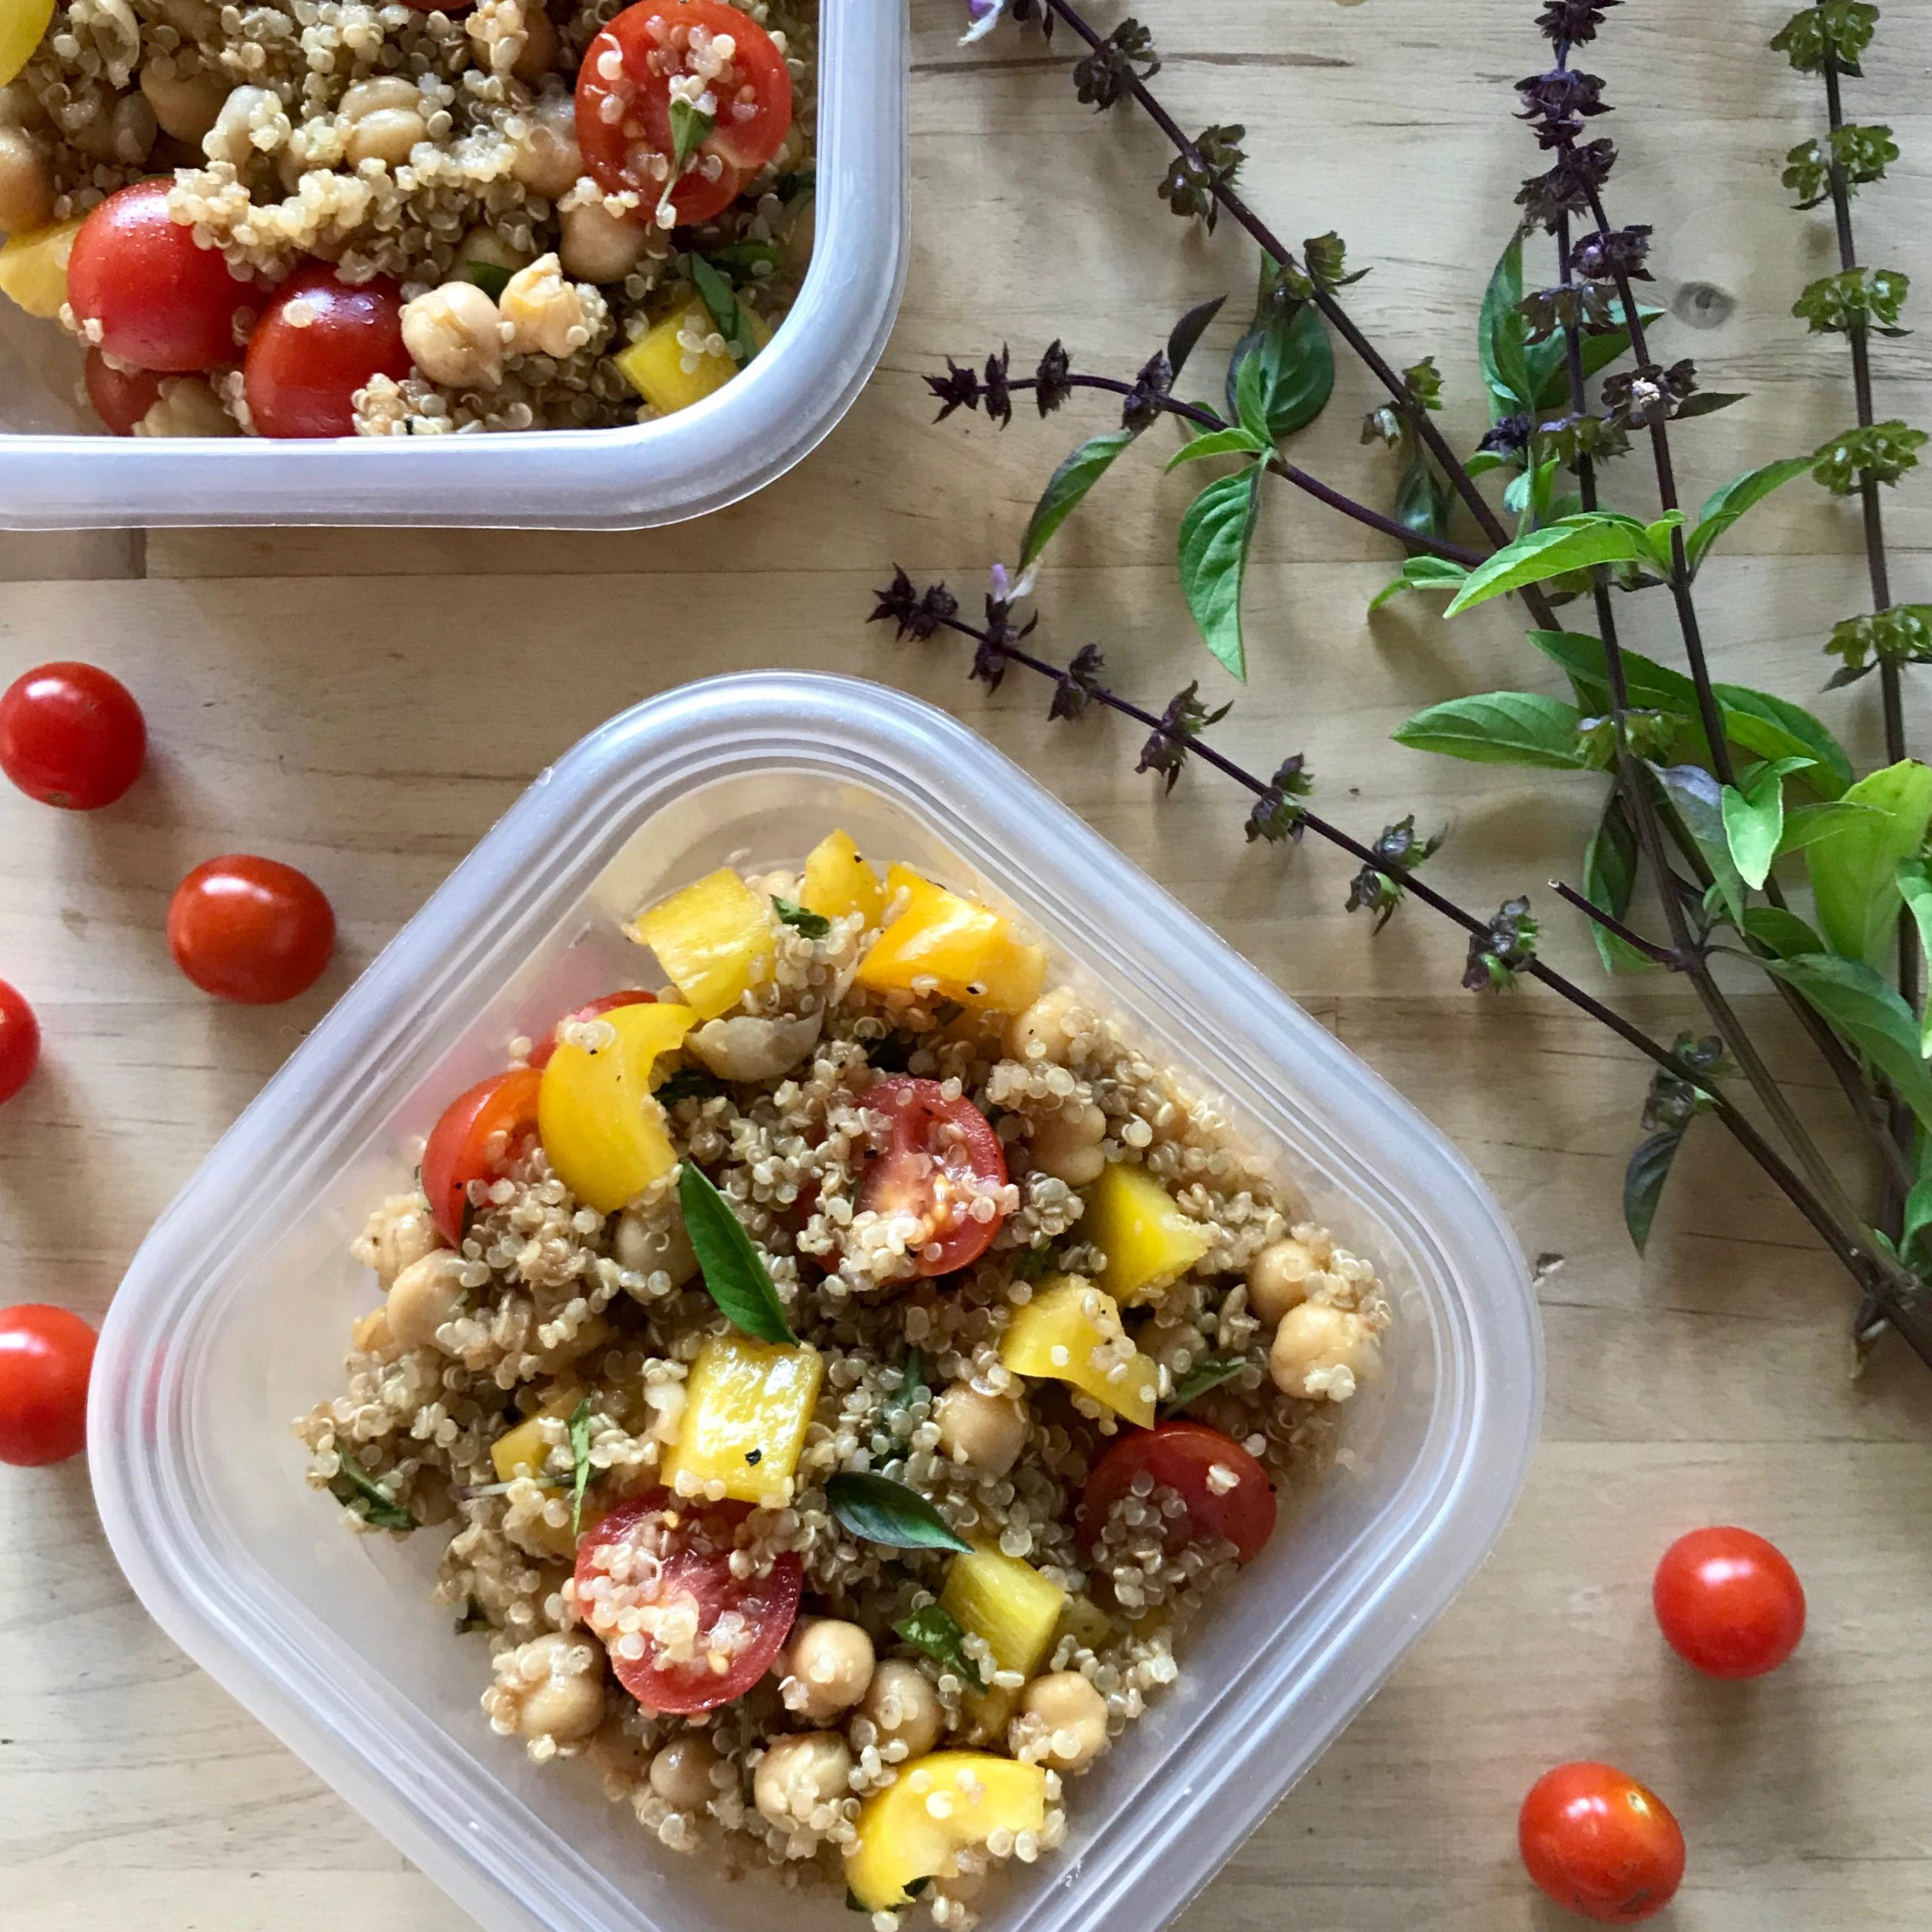 Salade de quinoa, pois chiches et tomates cerises